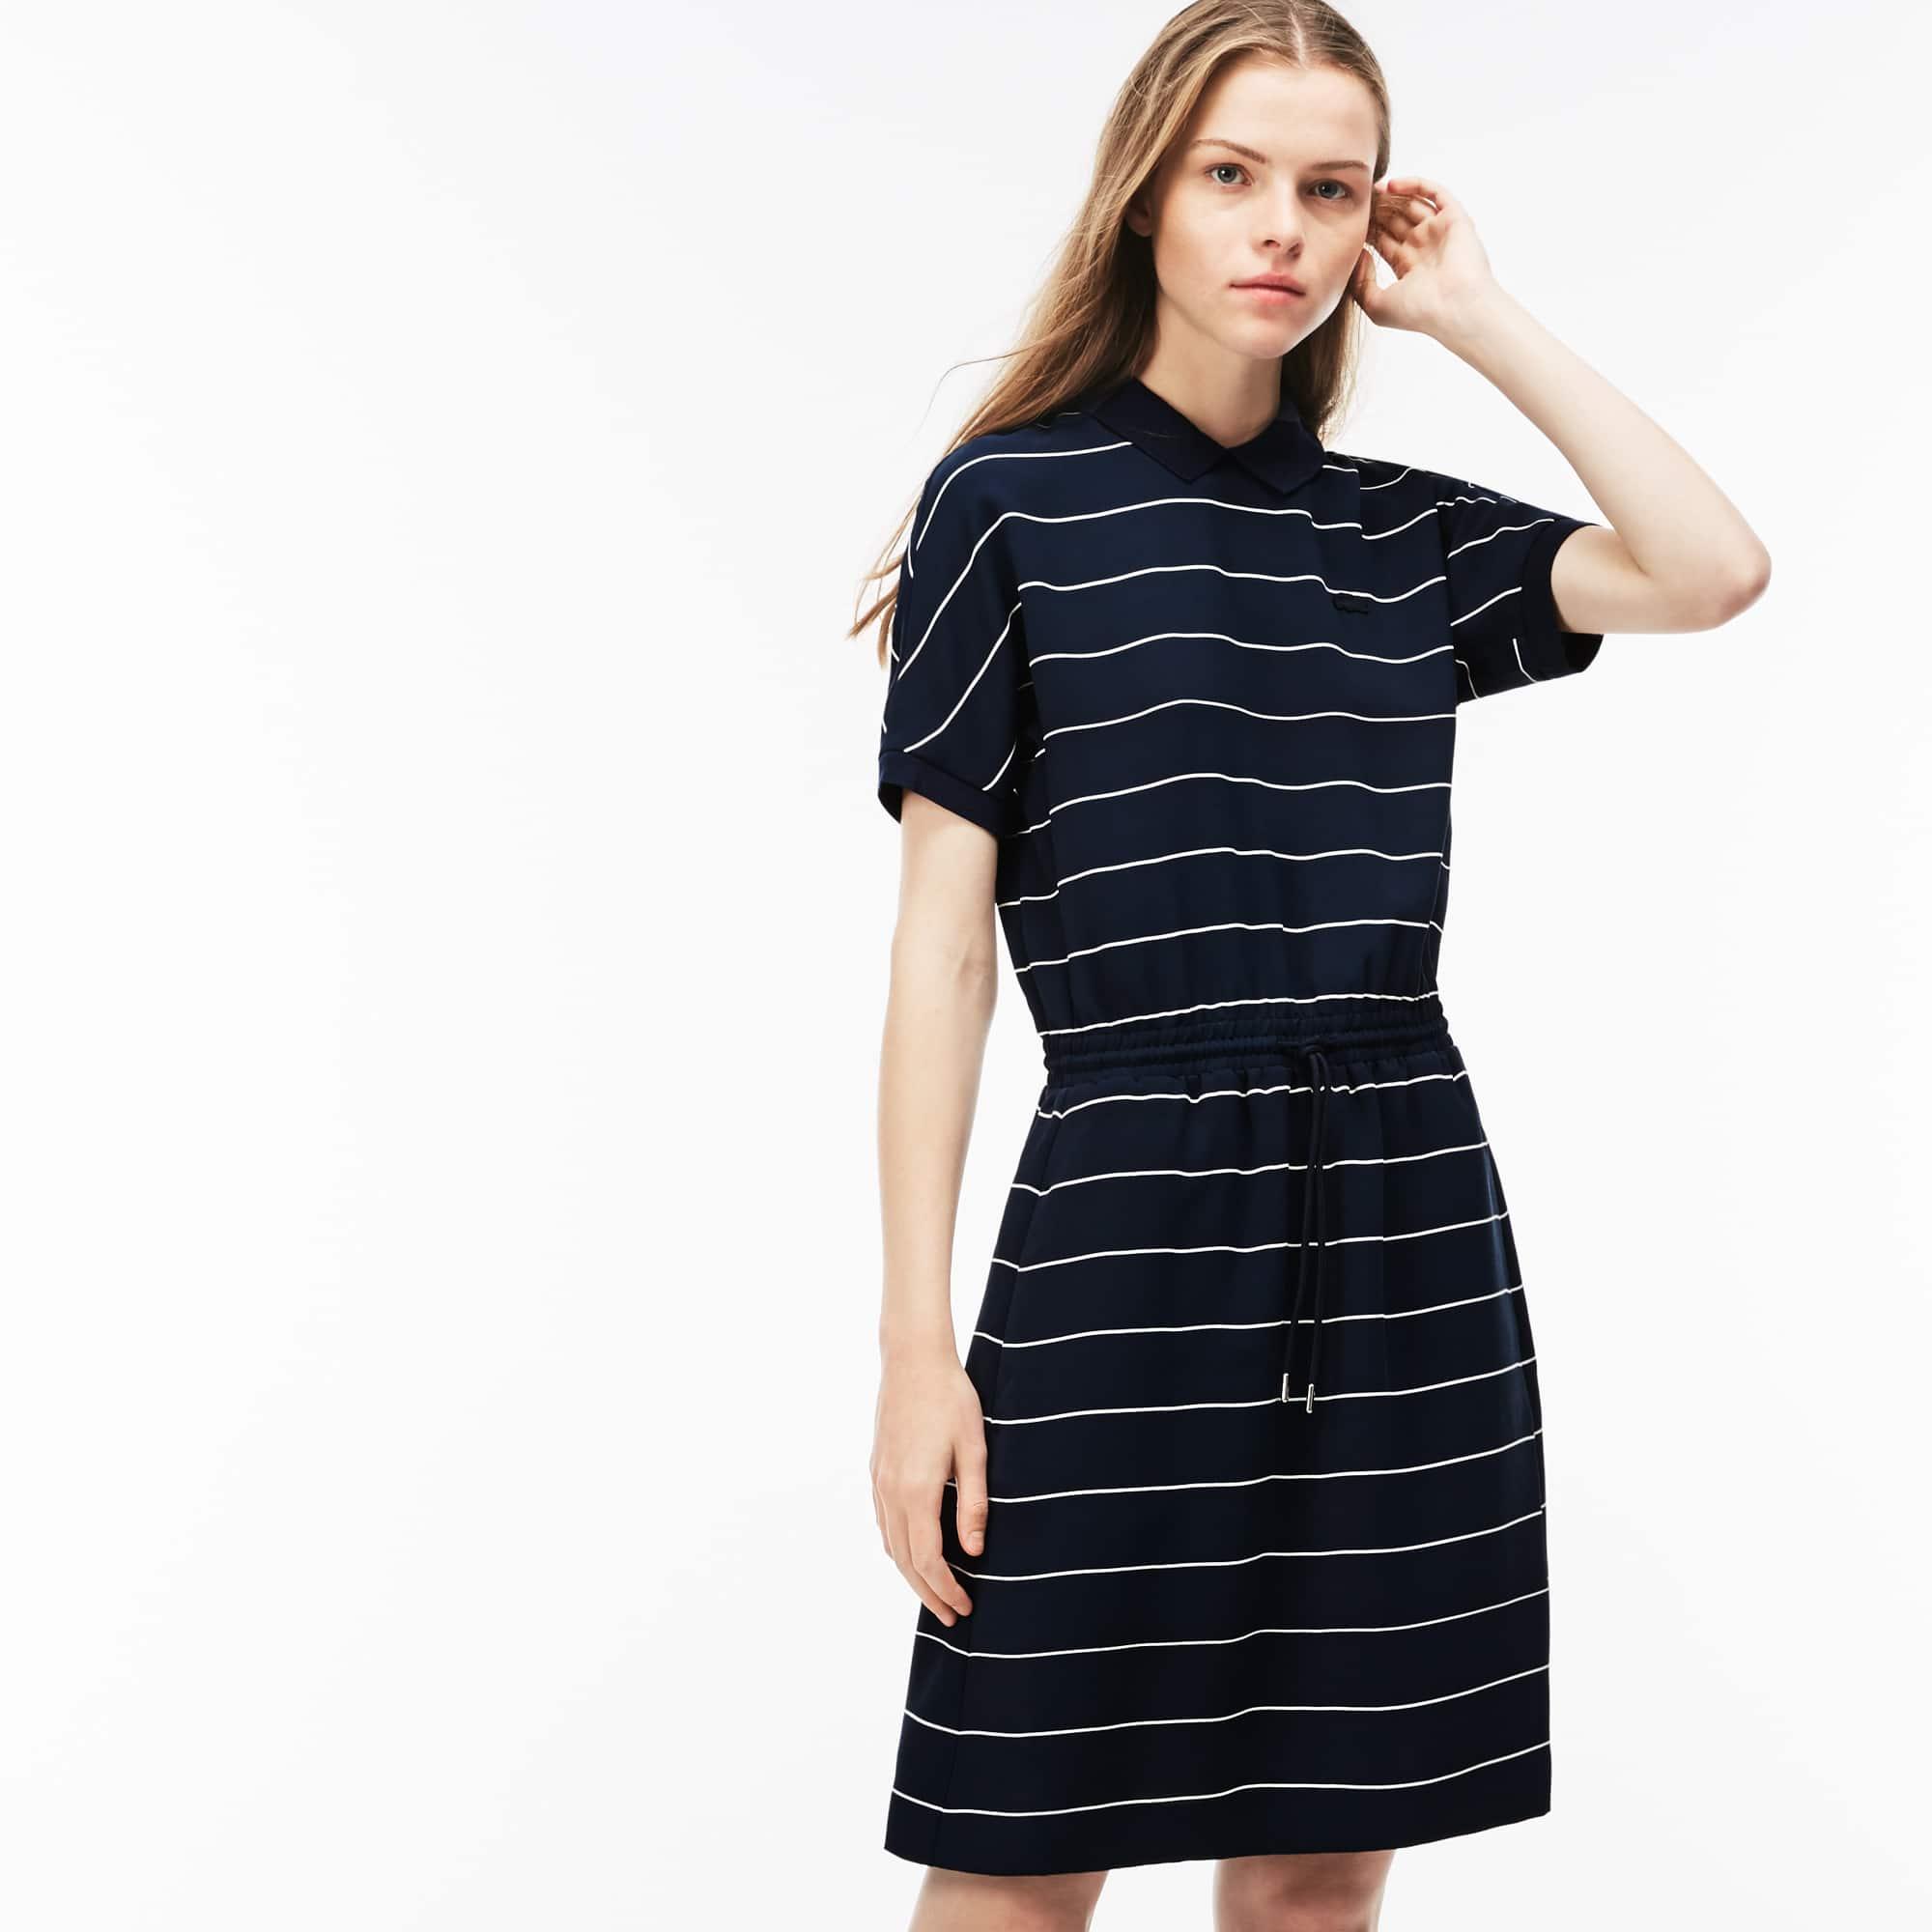 645a8521f تشكيلة ملابس   ملابس للنساء   LACOSTE